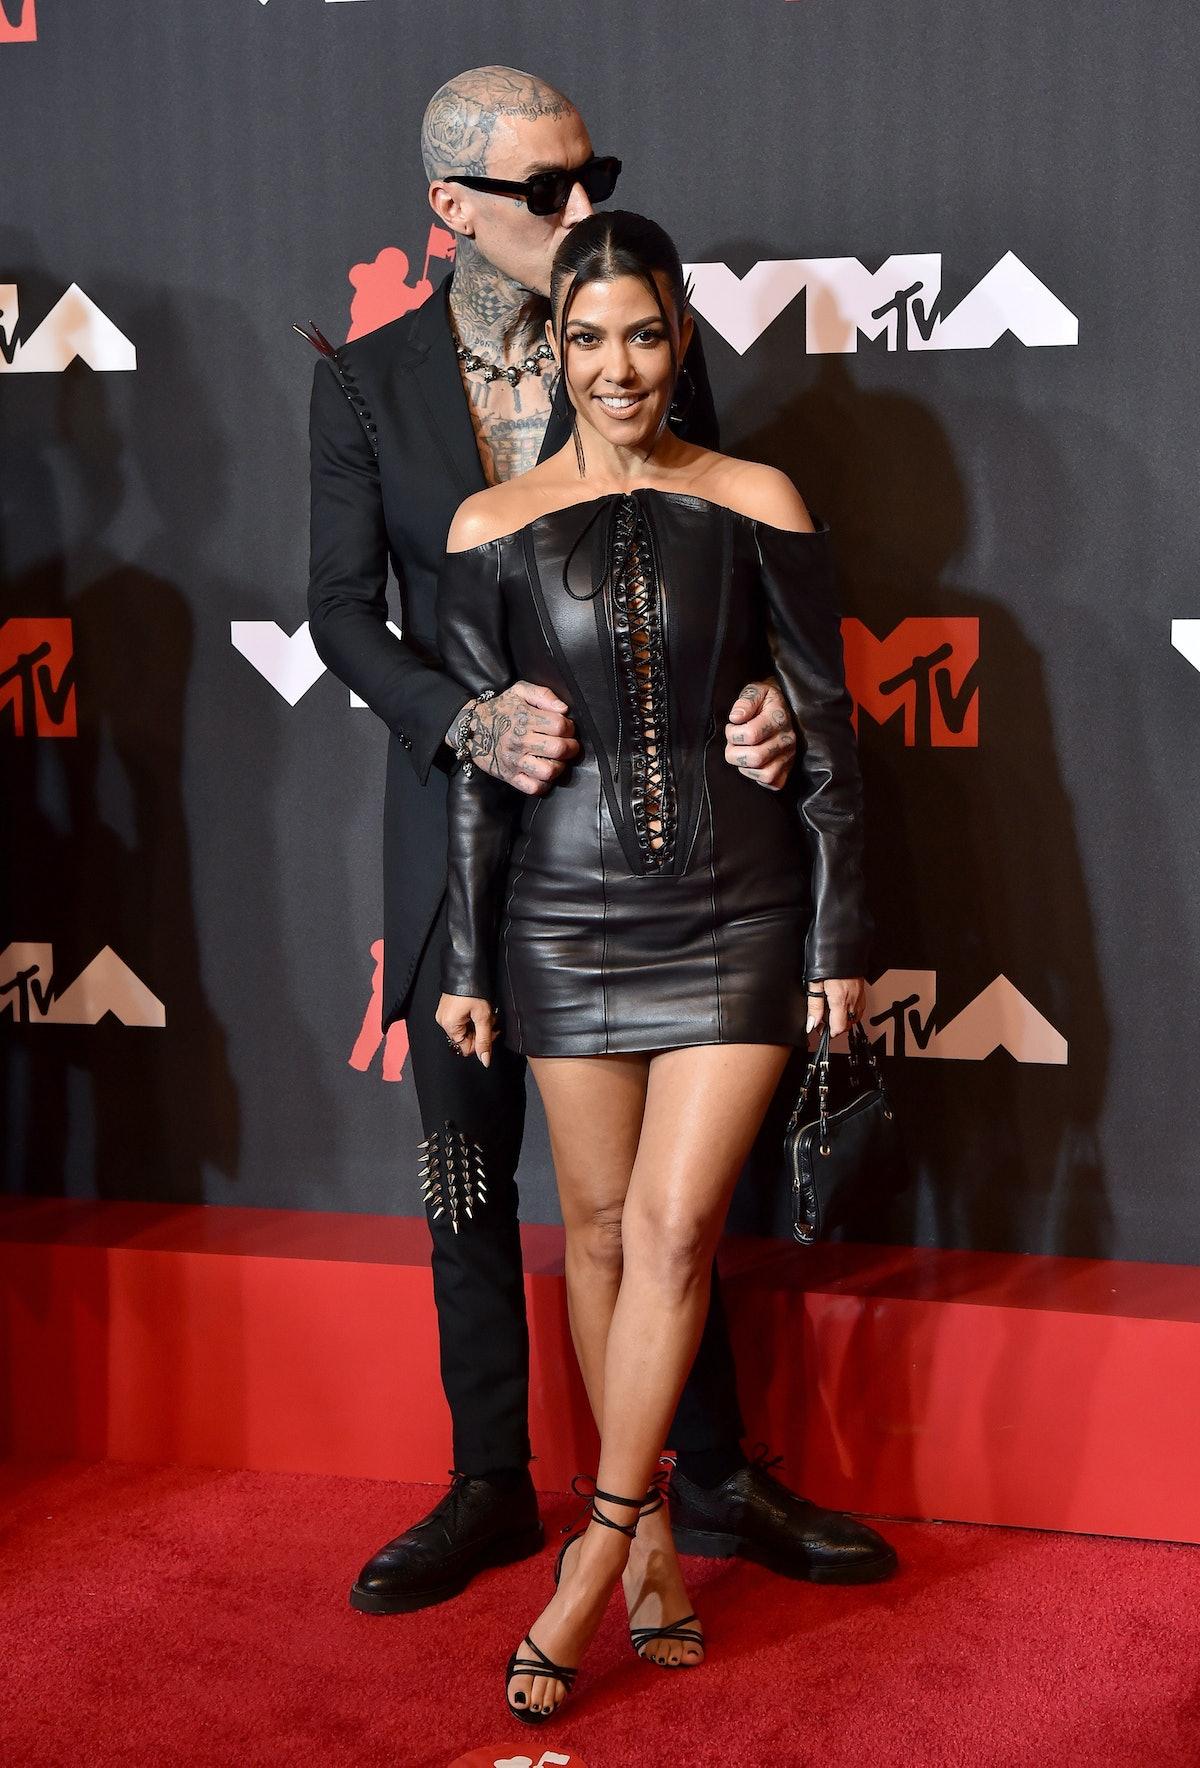 Kourtney Kardashian and Travis Barker's body language the VMAs was hot and heavy.